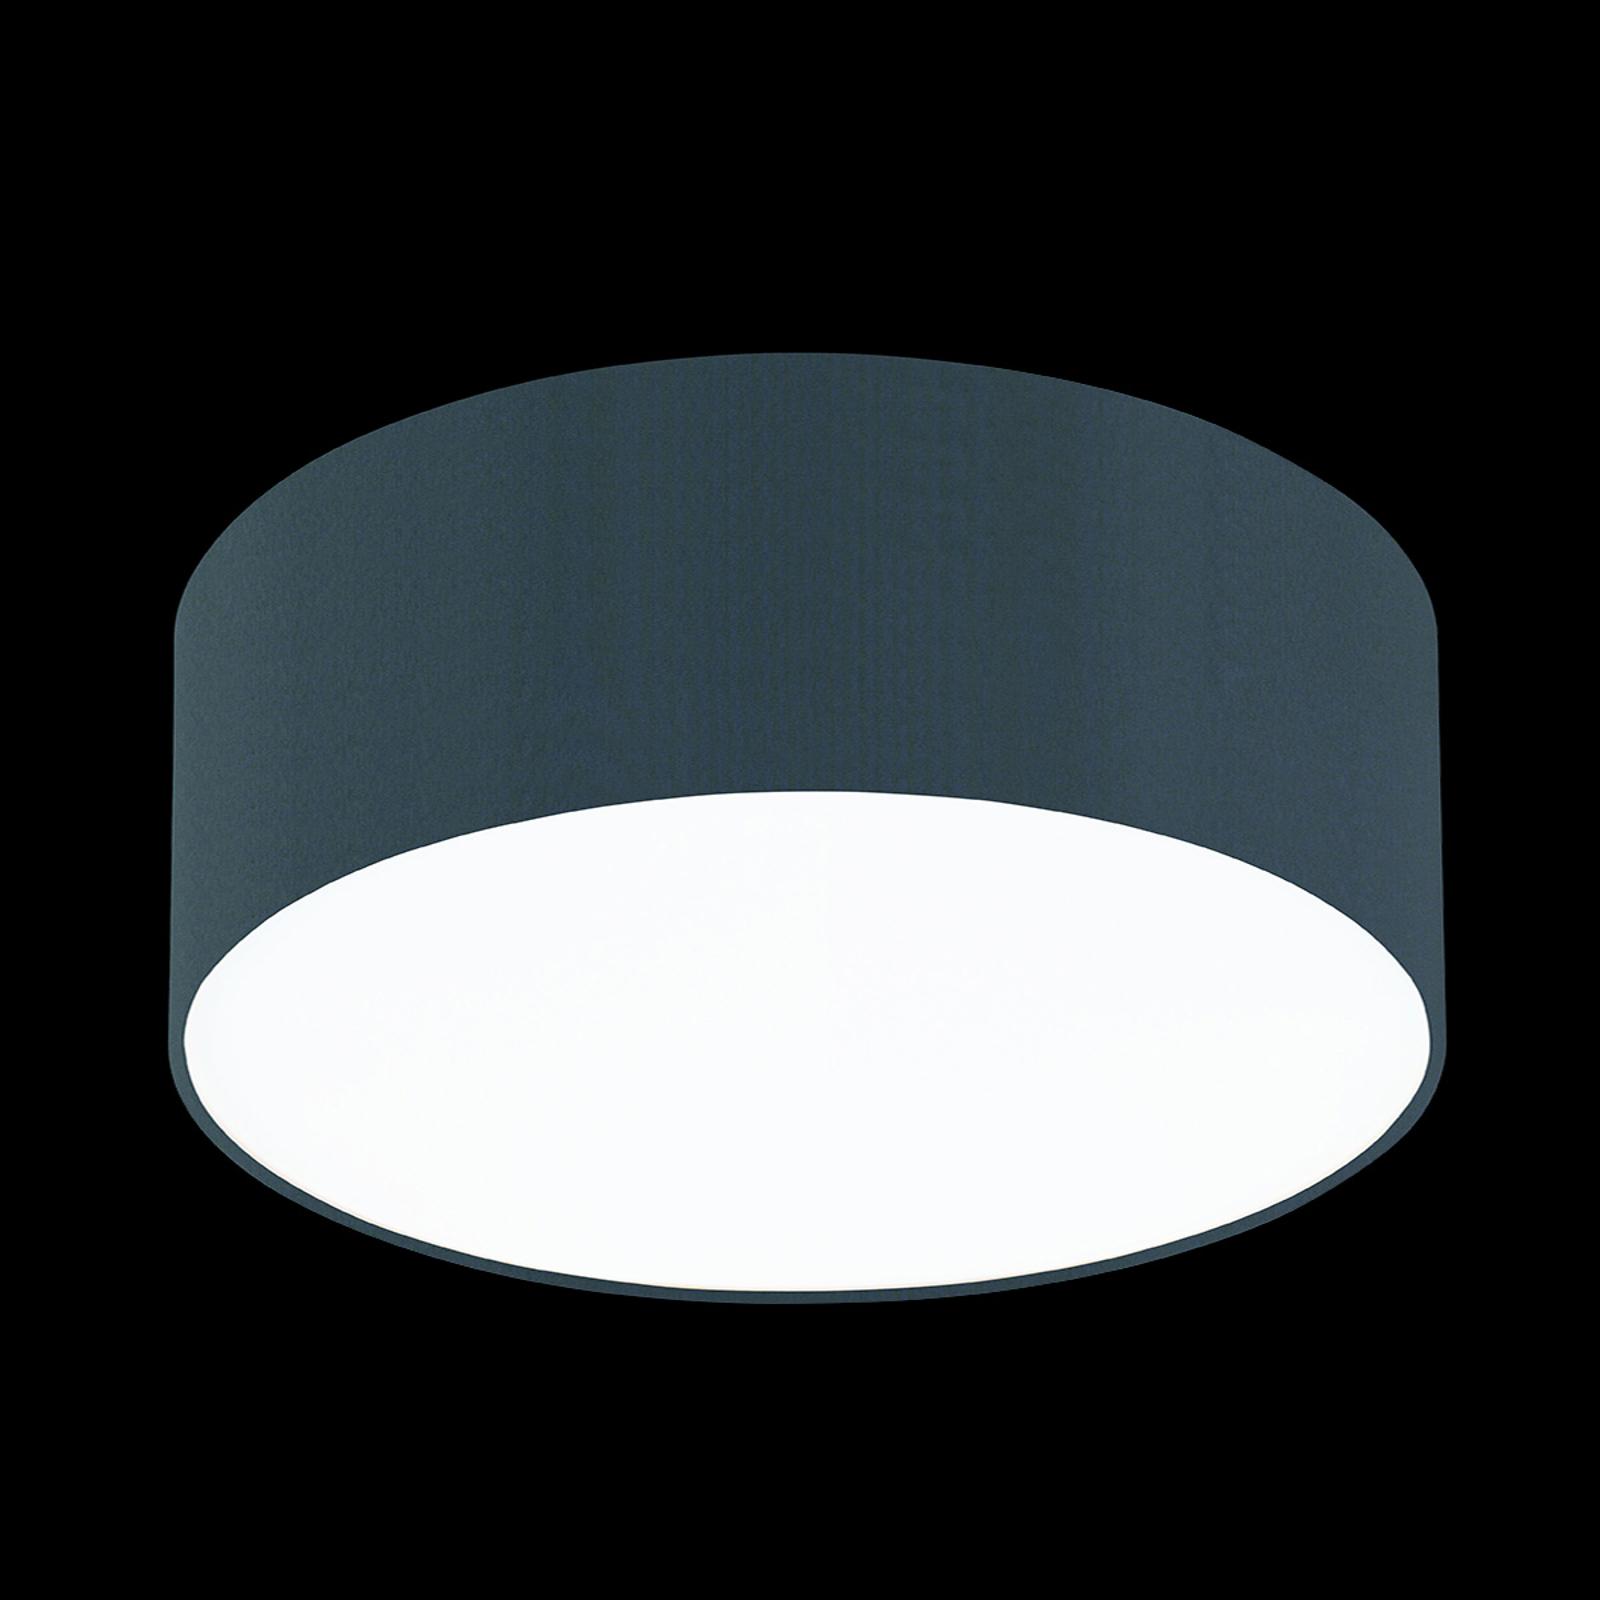 Lampa sufitowa MARA, 50 cm, szary łupek